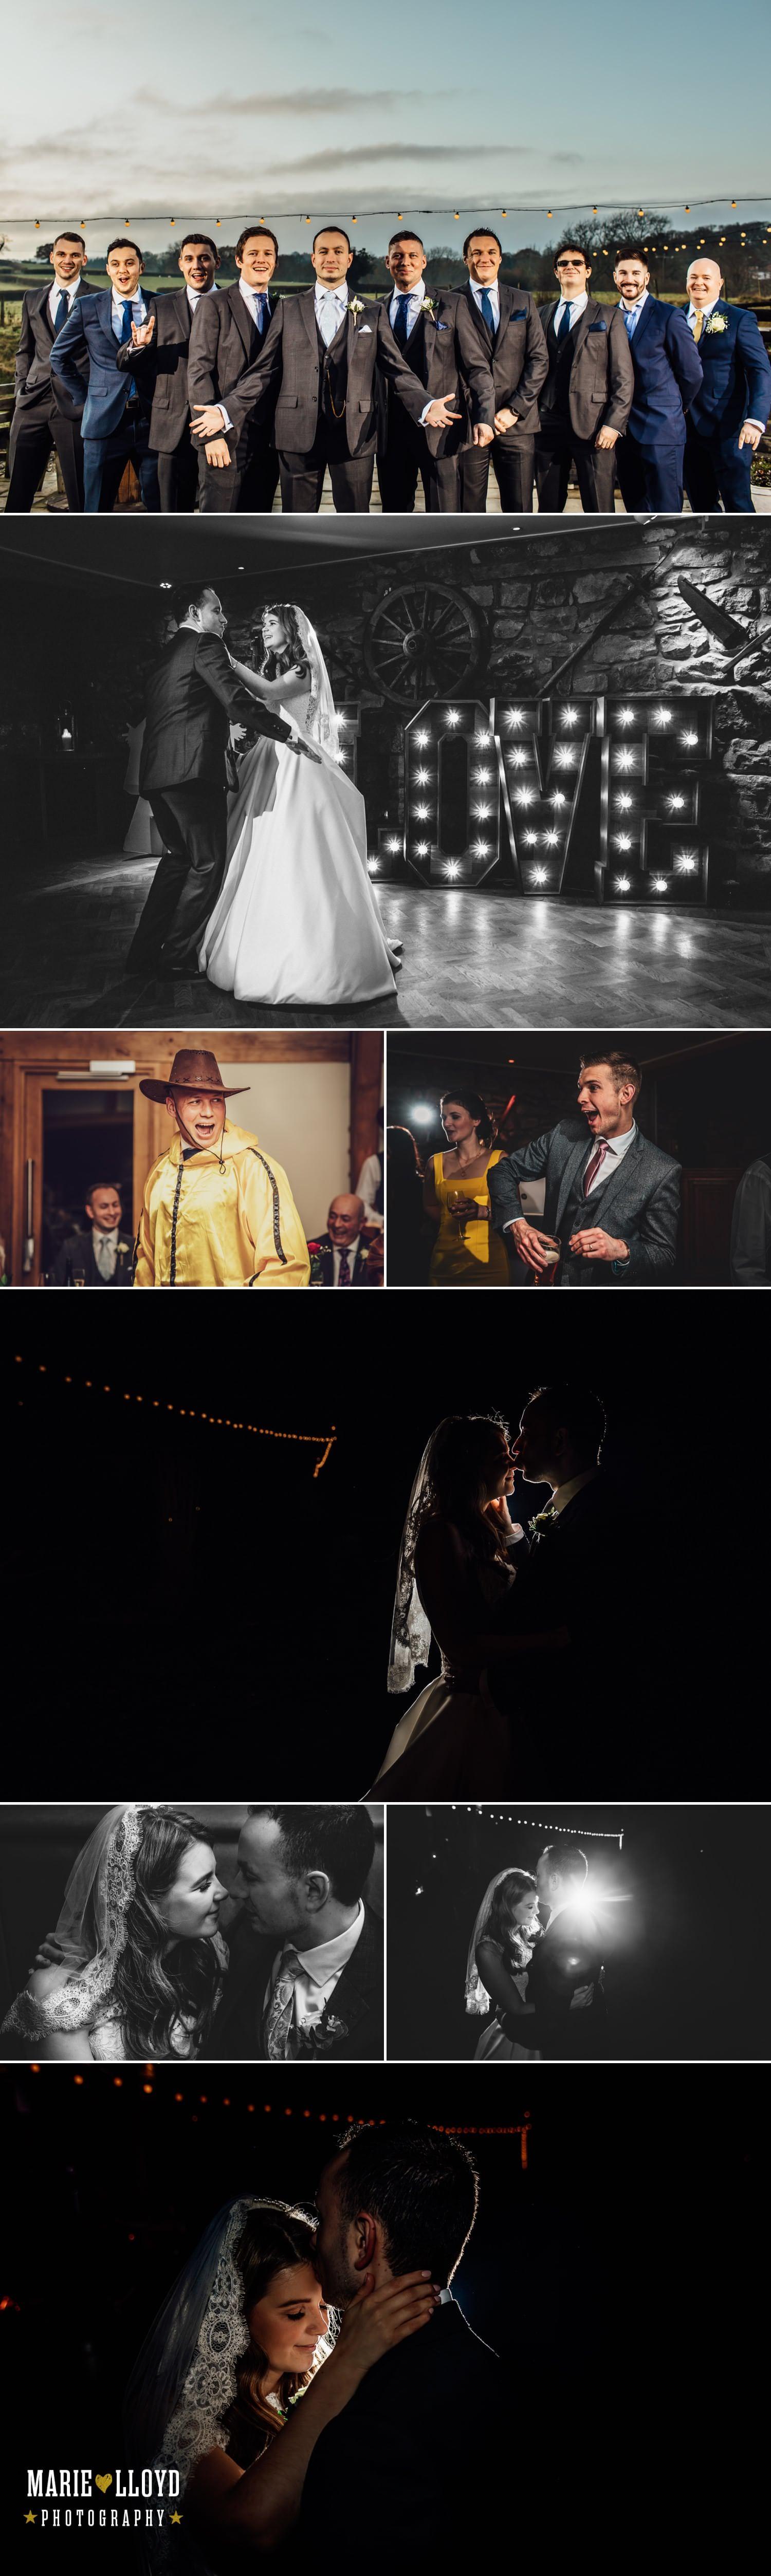 Wedding Photography Tower hill barns, evening wedding photography